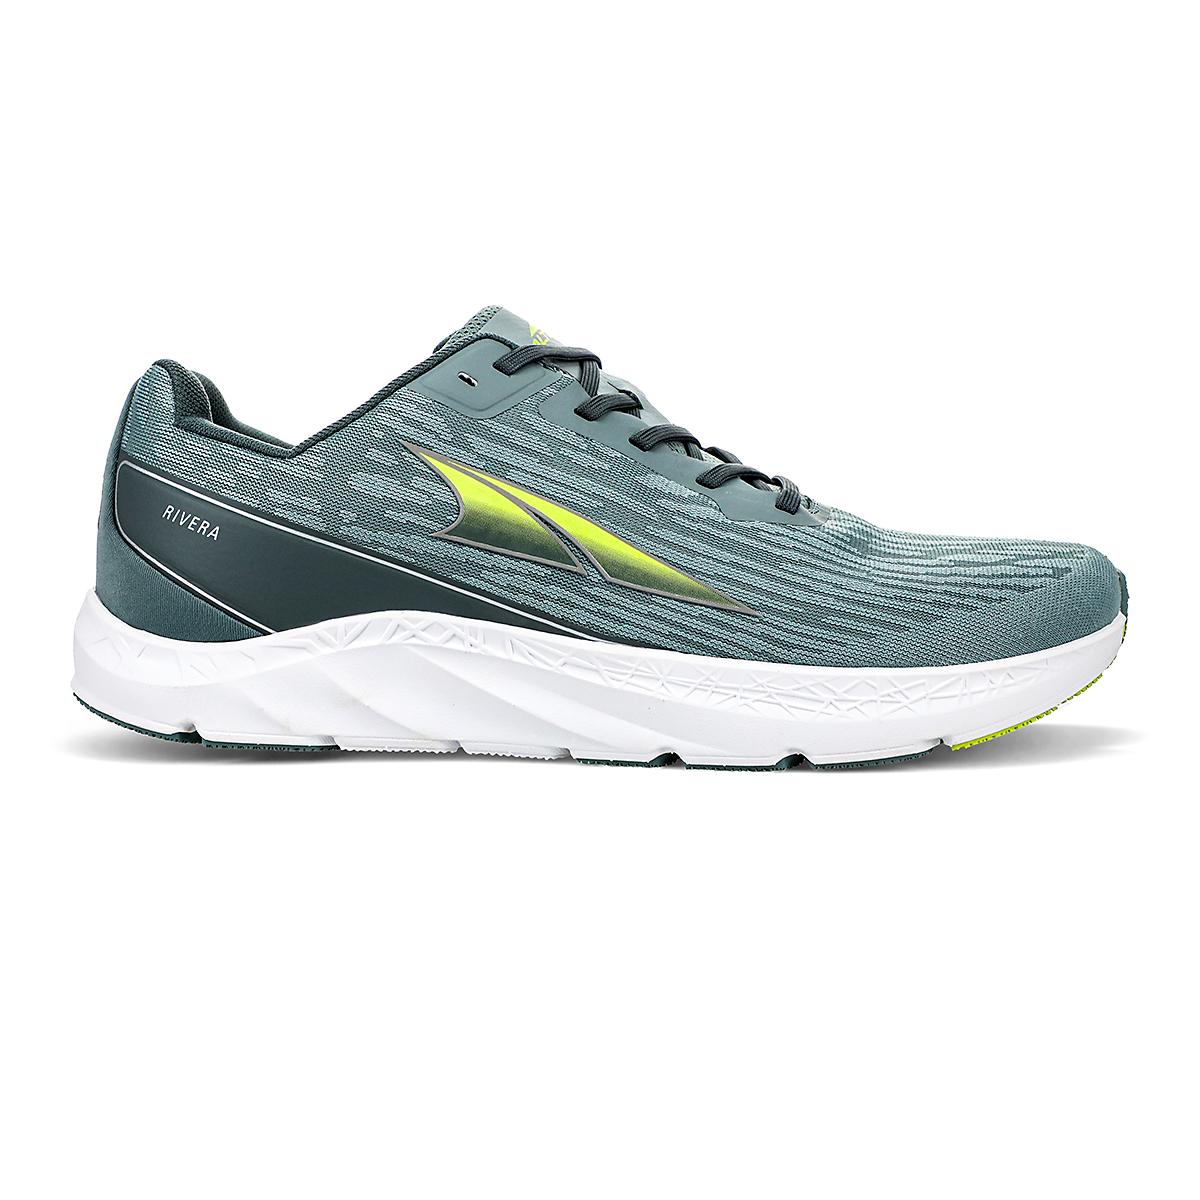 Men's Altra Rivera Running Shoe - Color: Green - Size: 7 - Width: Regular, Green, large, image 1